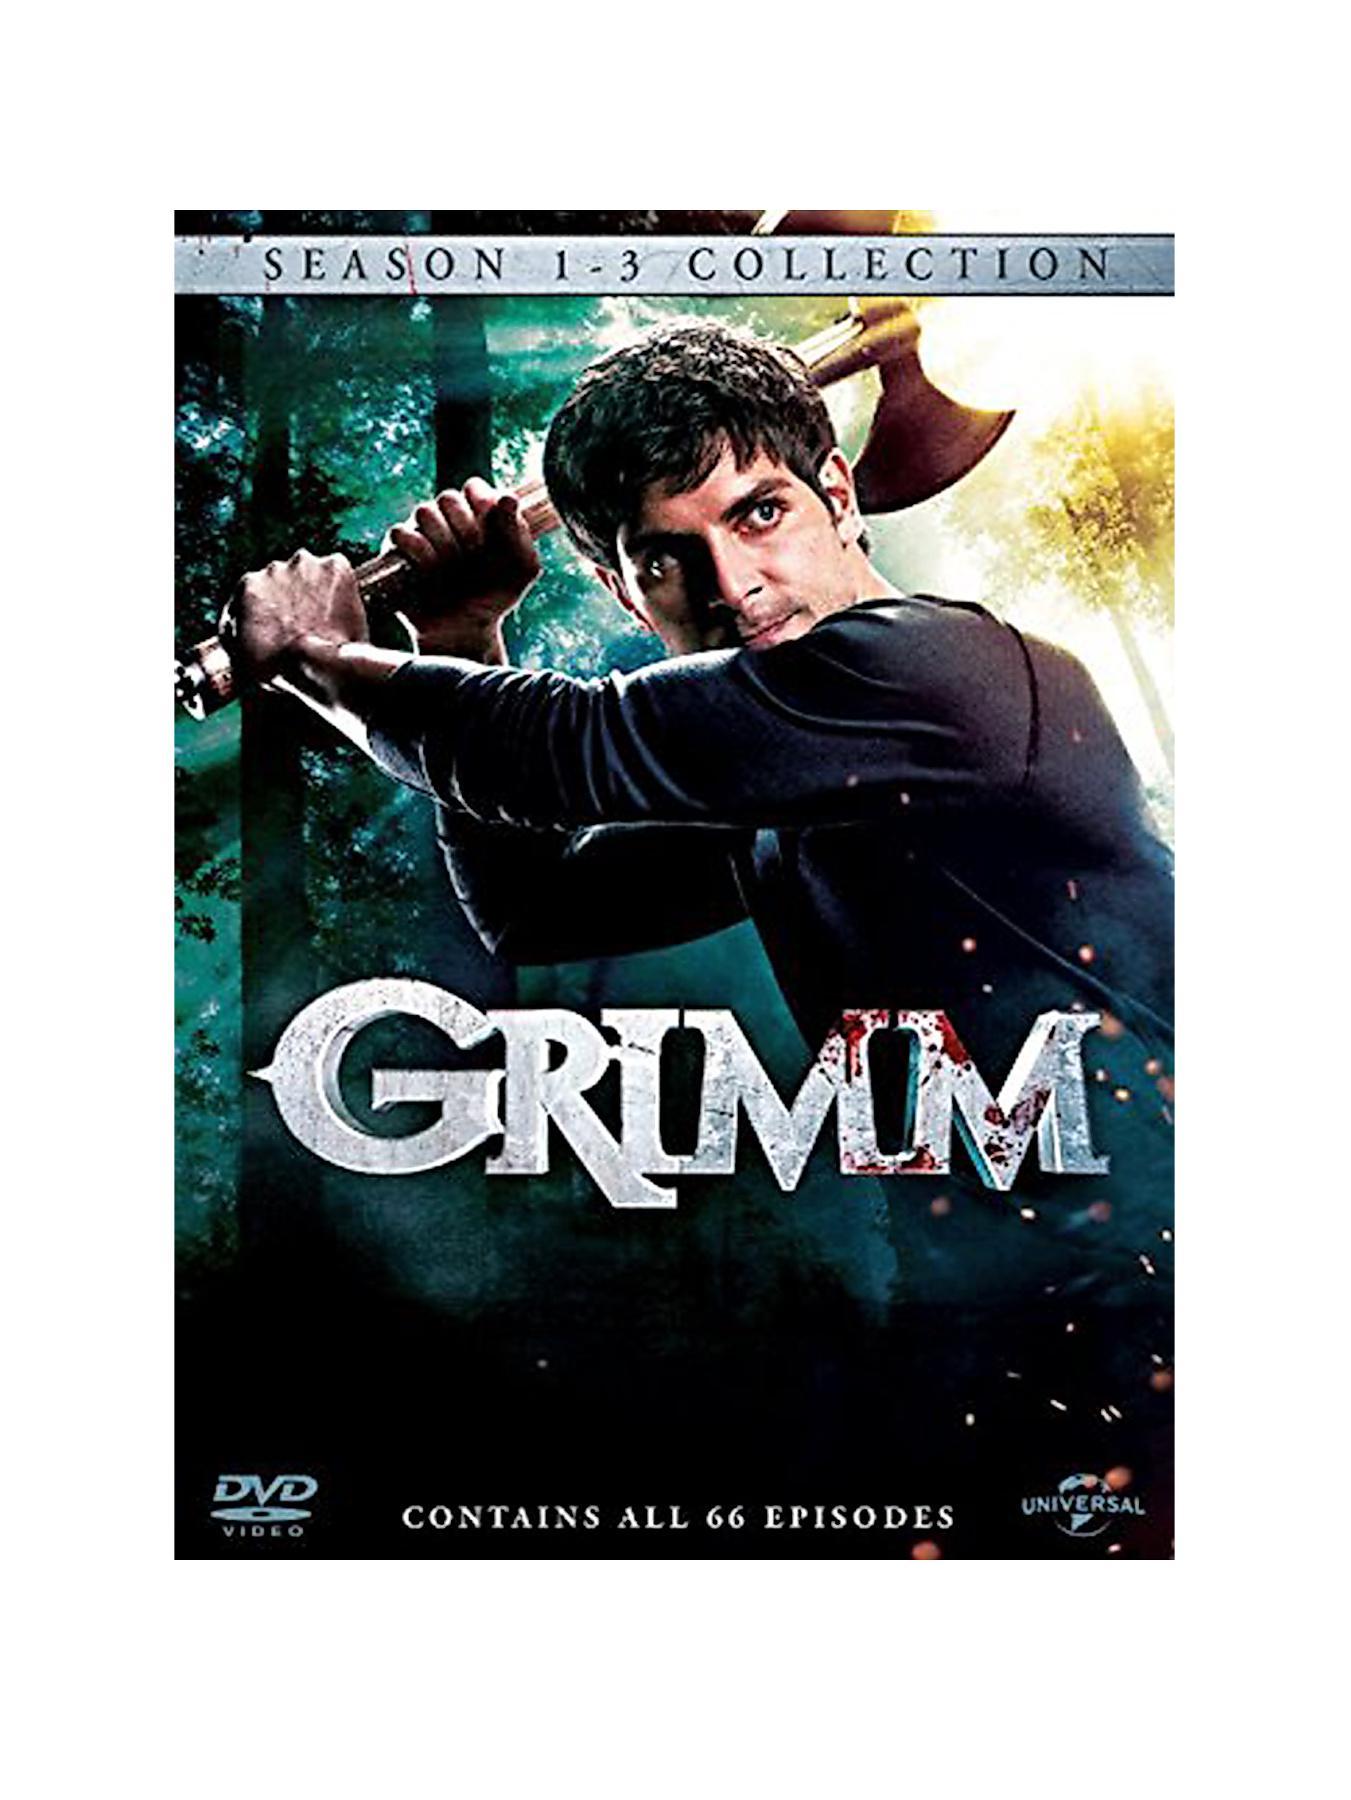 Grimm - Seasons 1-3 DVD Boxset